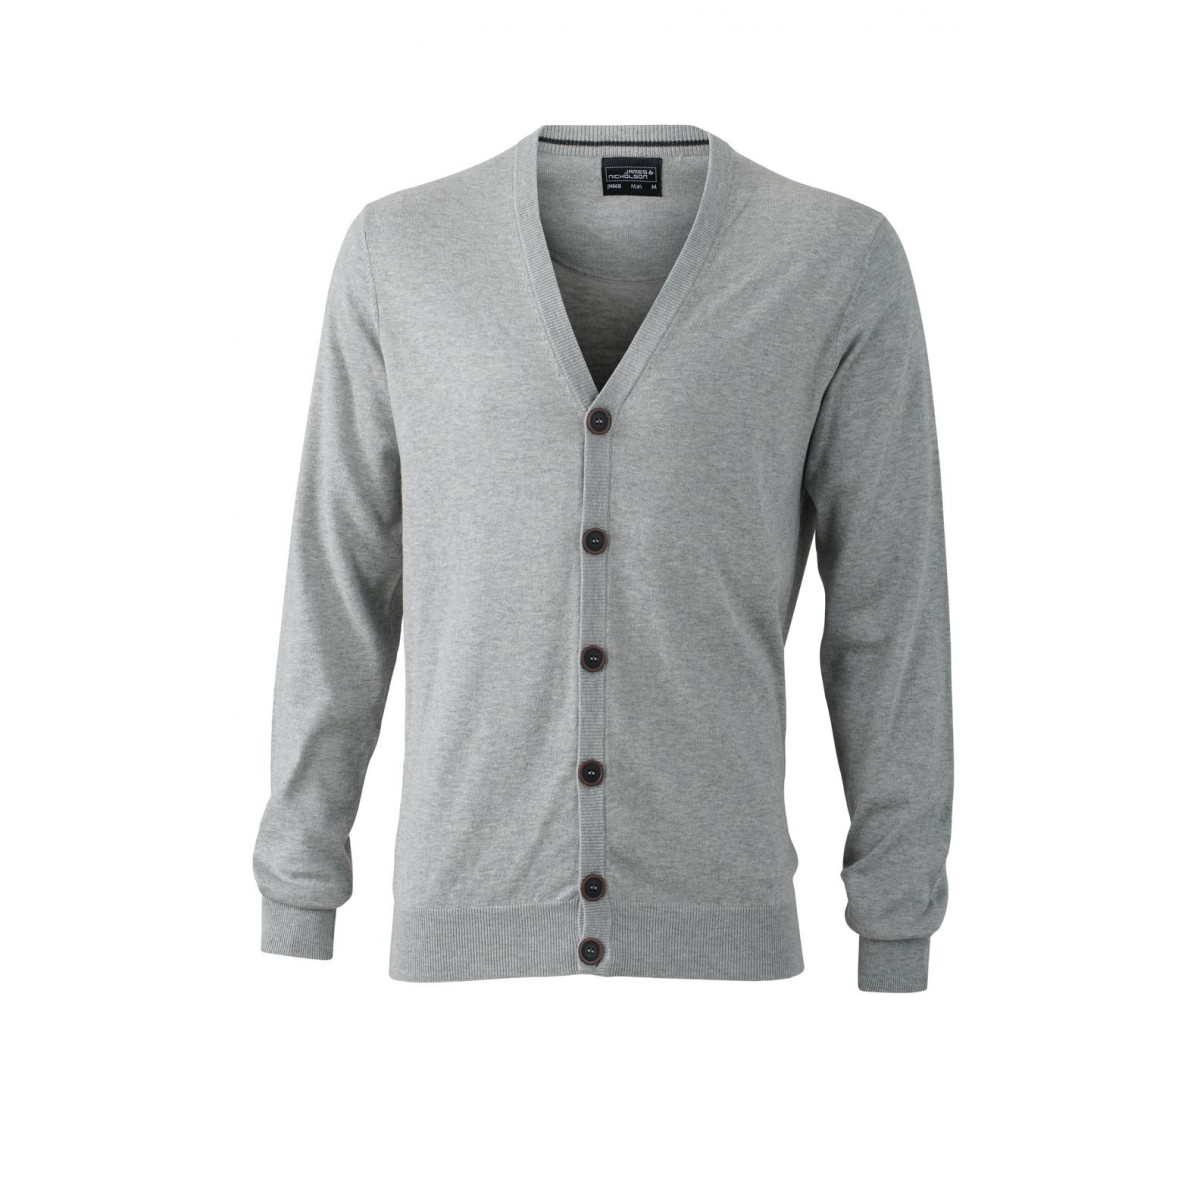 Кардиган мужской JN668 Mens Cardigan - Серый меланж